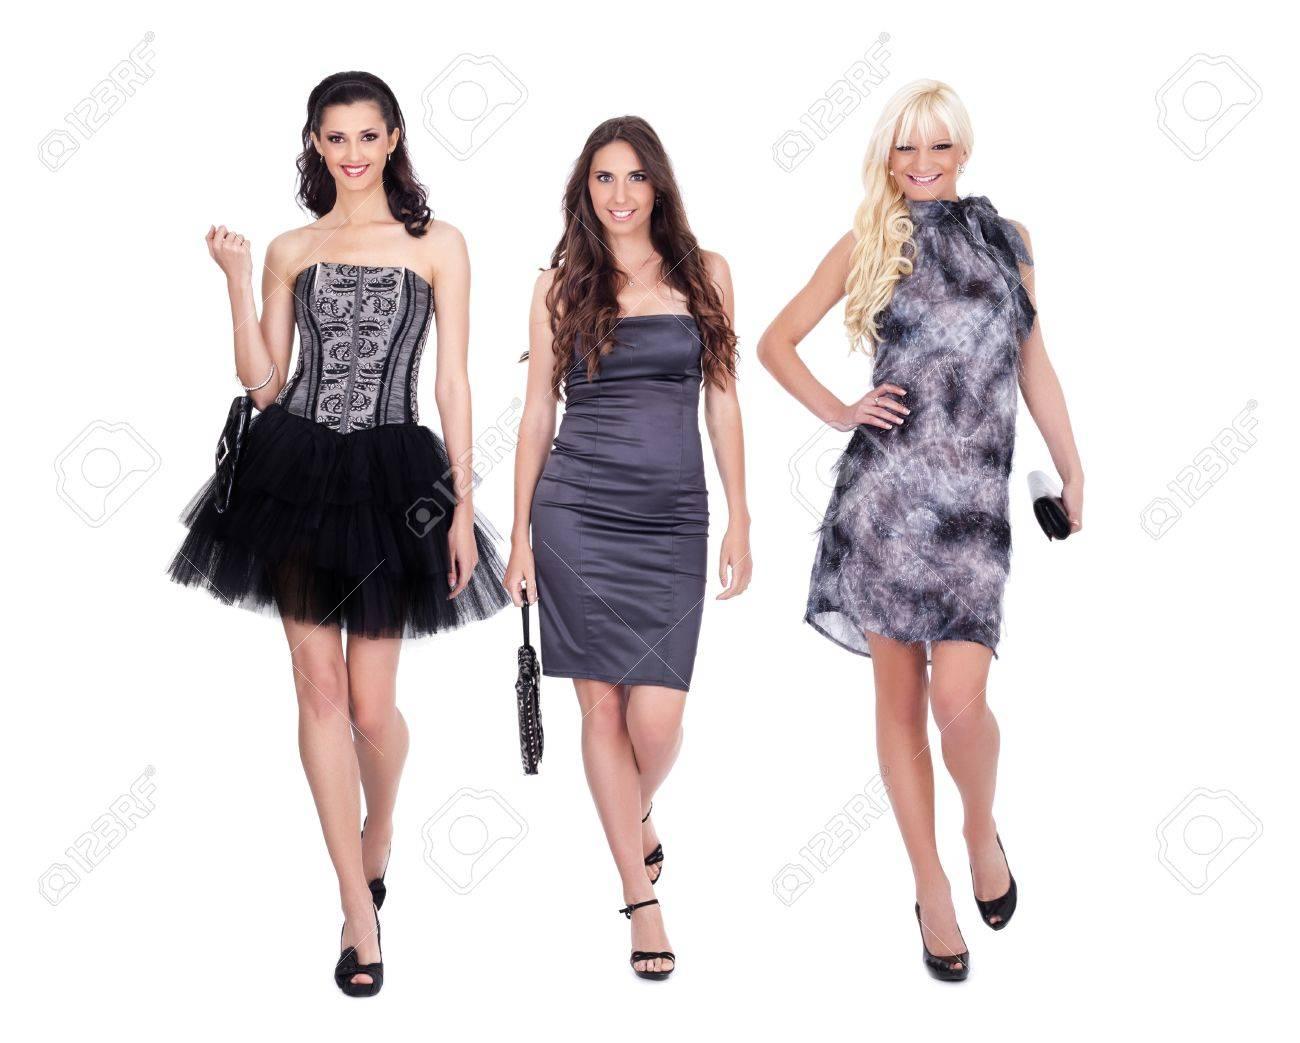 Fashion Girls In Dresses Smiling Walking Towards The Camera ...